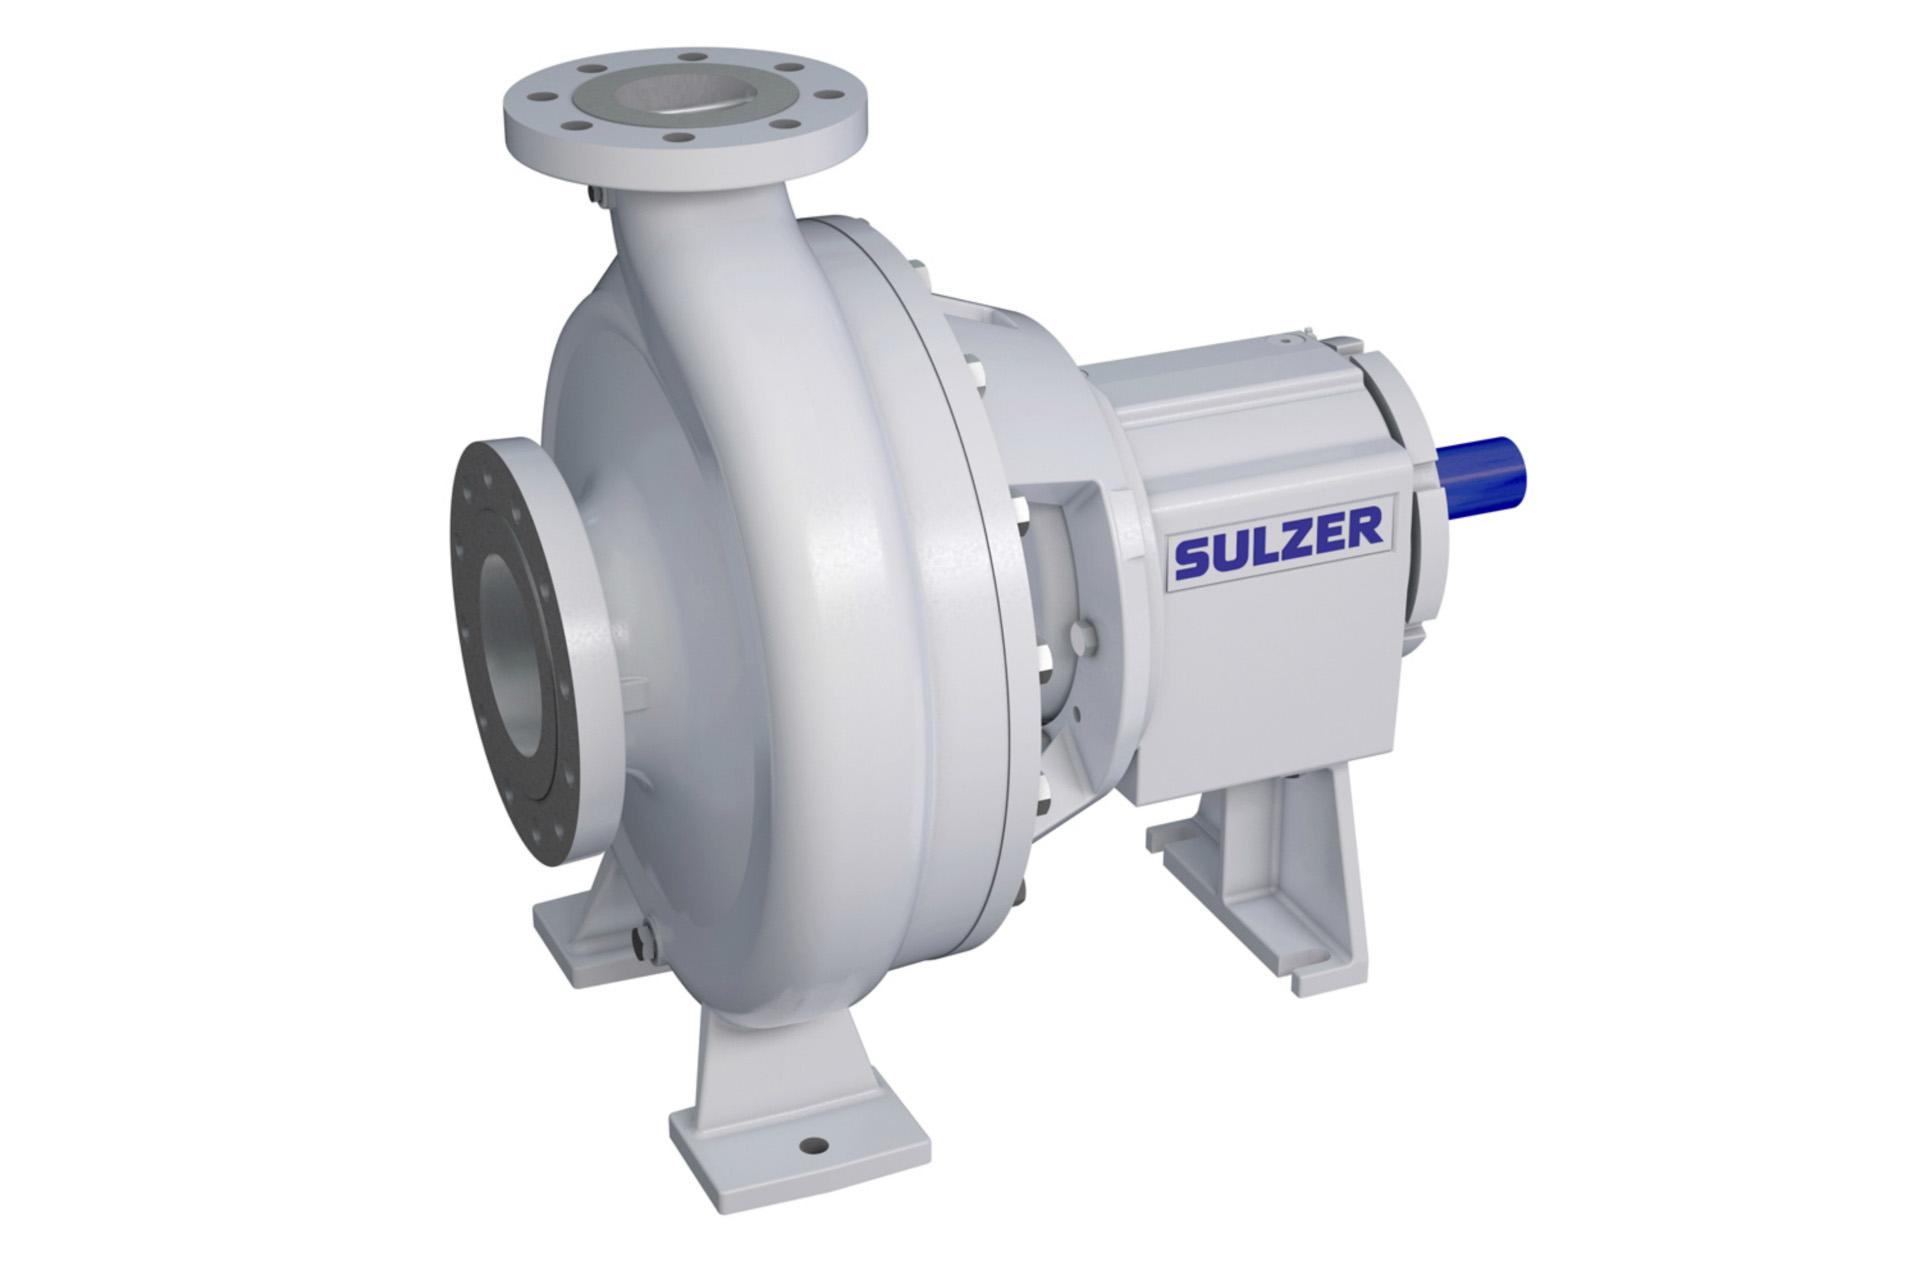 1Sulzer process B73 chemical CPT pumpANSIASME srdthQC